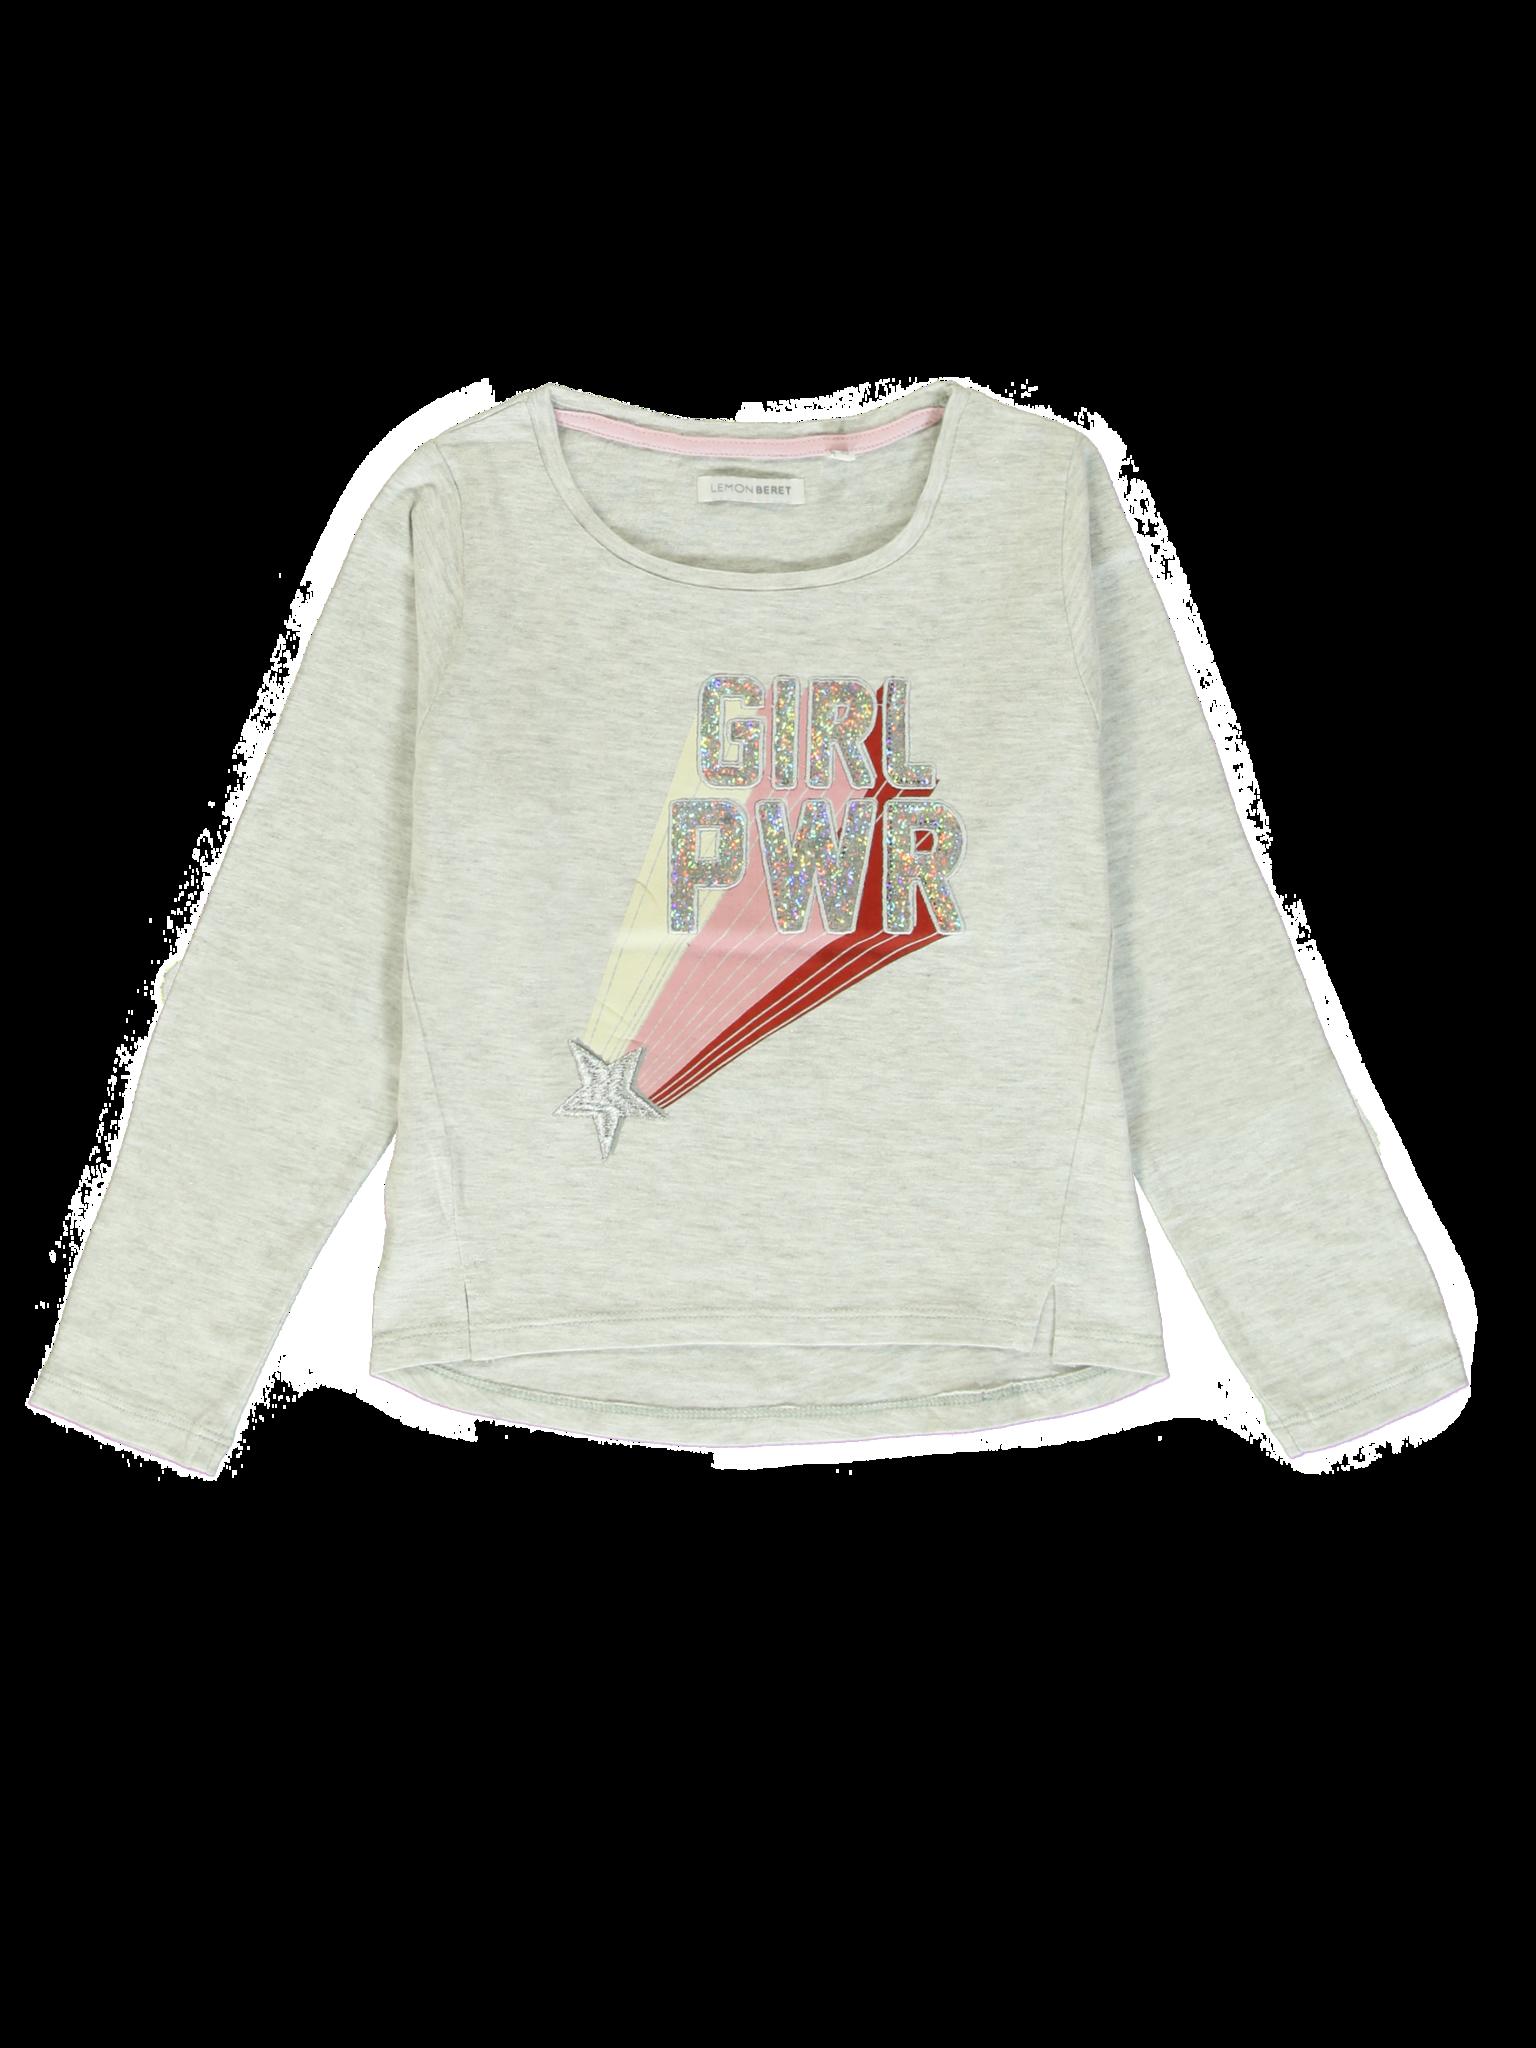 All Brands | Winterproducts Small Girls | T-shirt | 12 pcs/box